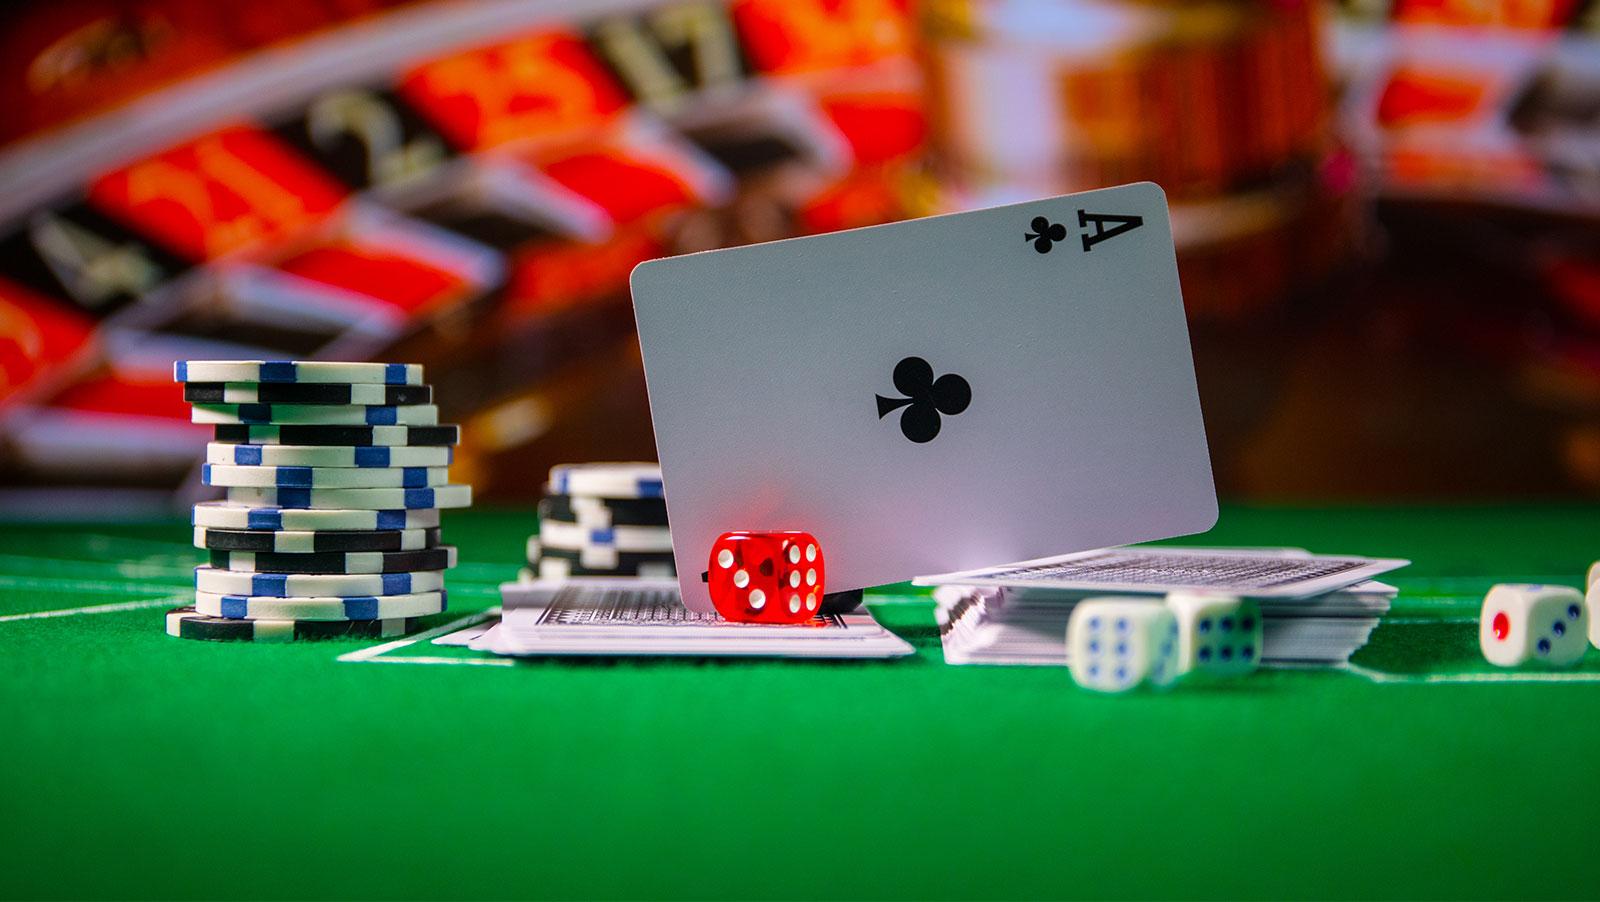 Making Cash at Online Casino Games